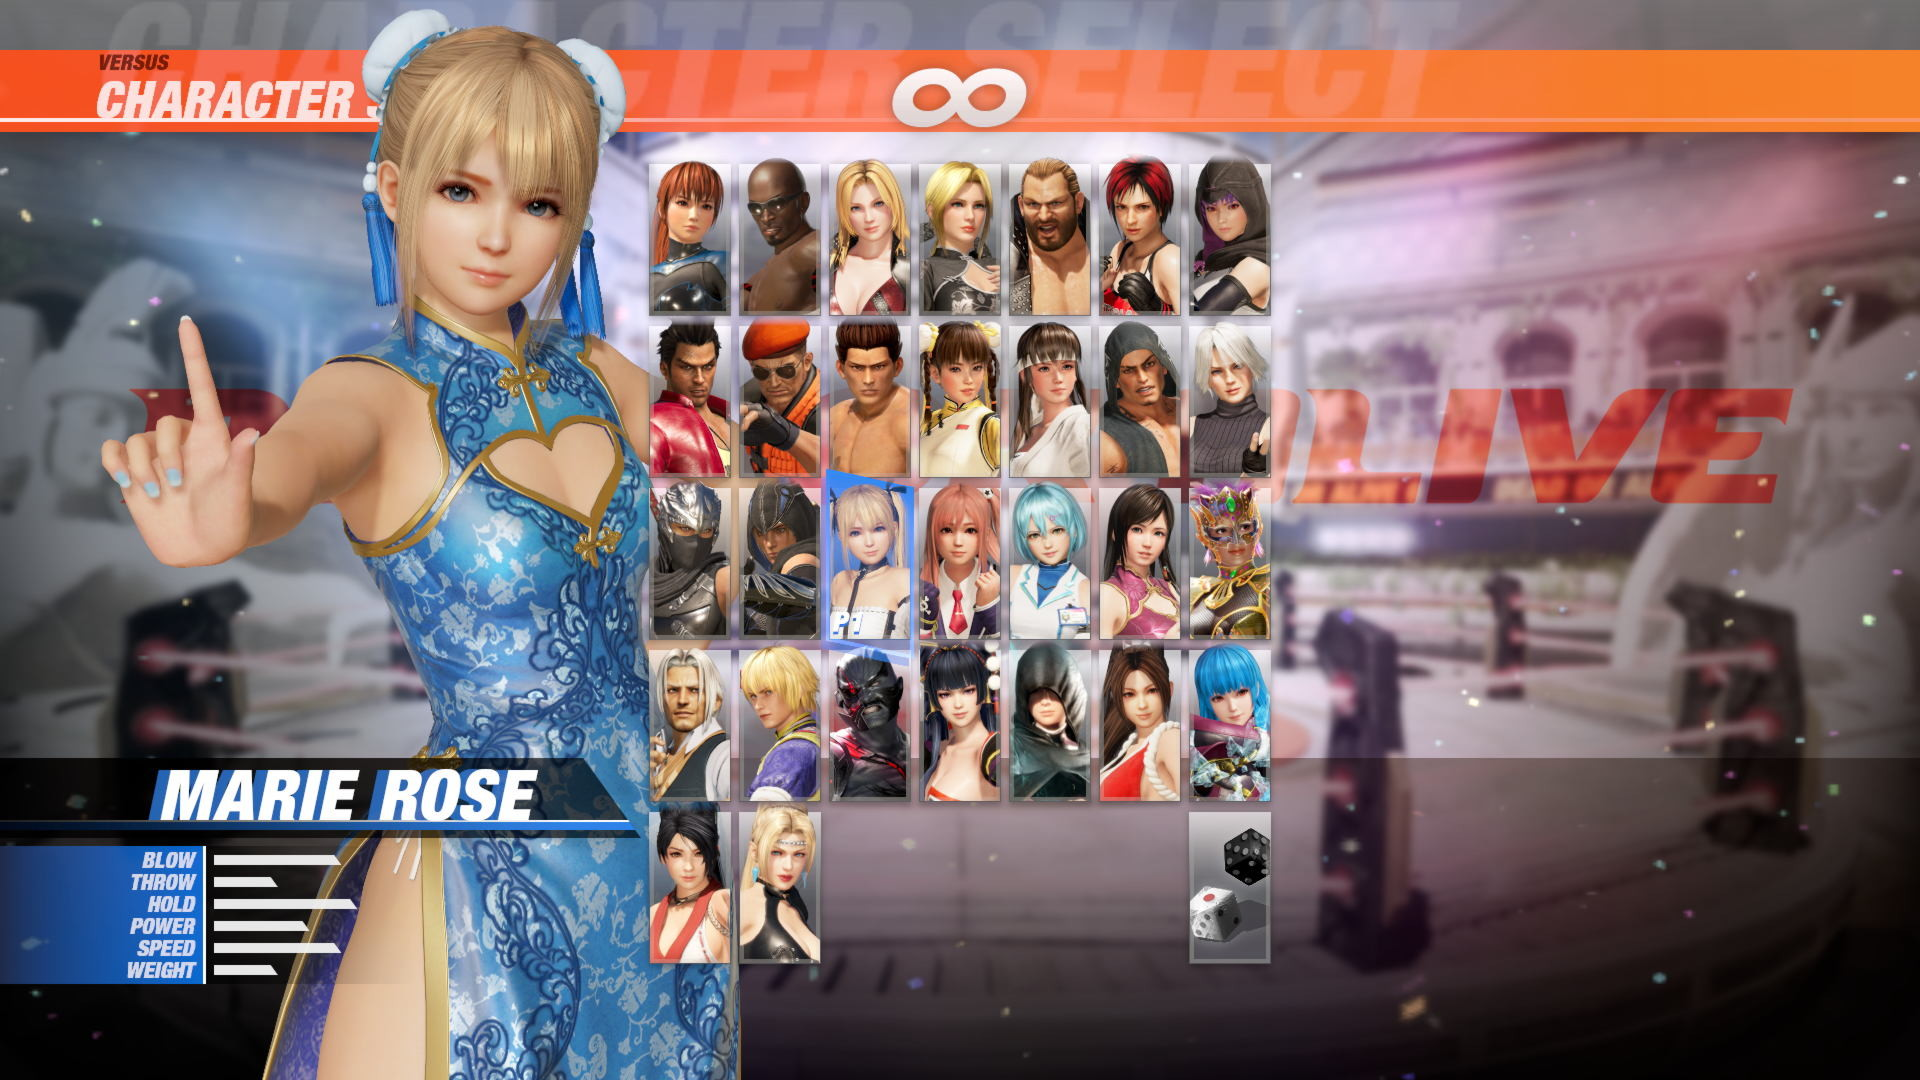 [Revival] DOA6 Alluring Mandarin Dress - Marie Rose screenshot